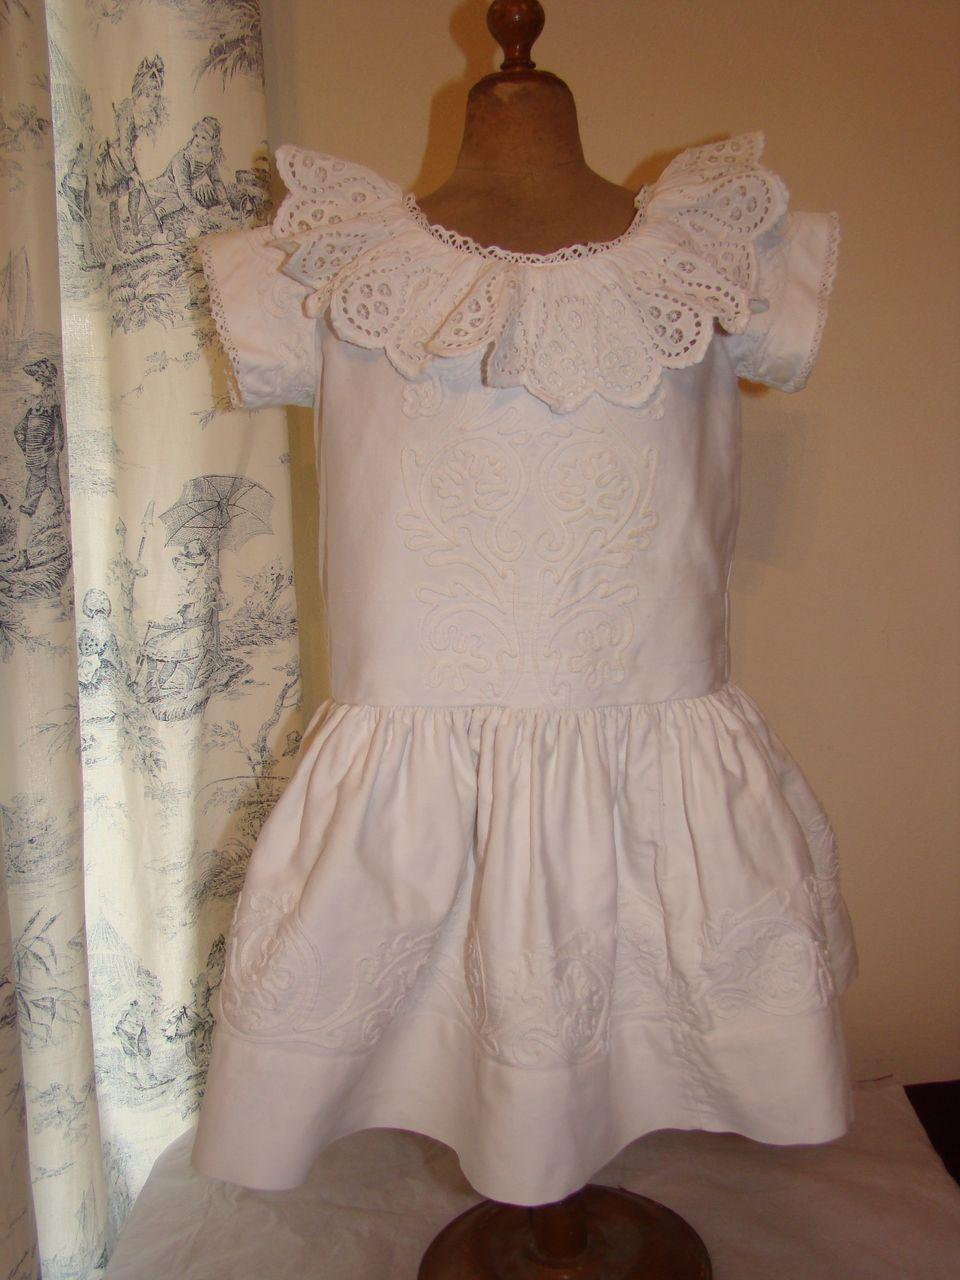 Beautiful 1875 pique dress with soutache trim for a large doll